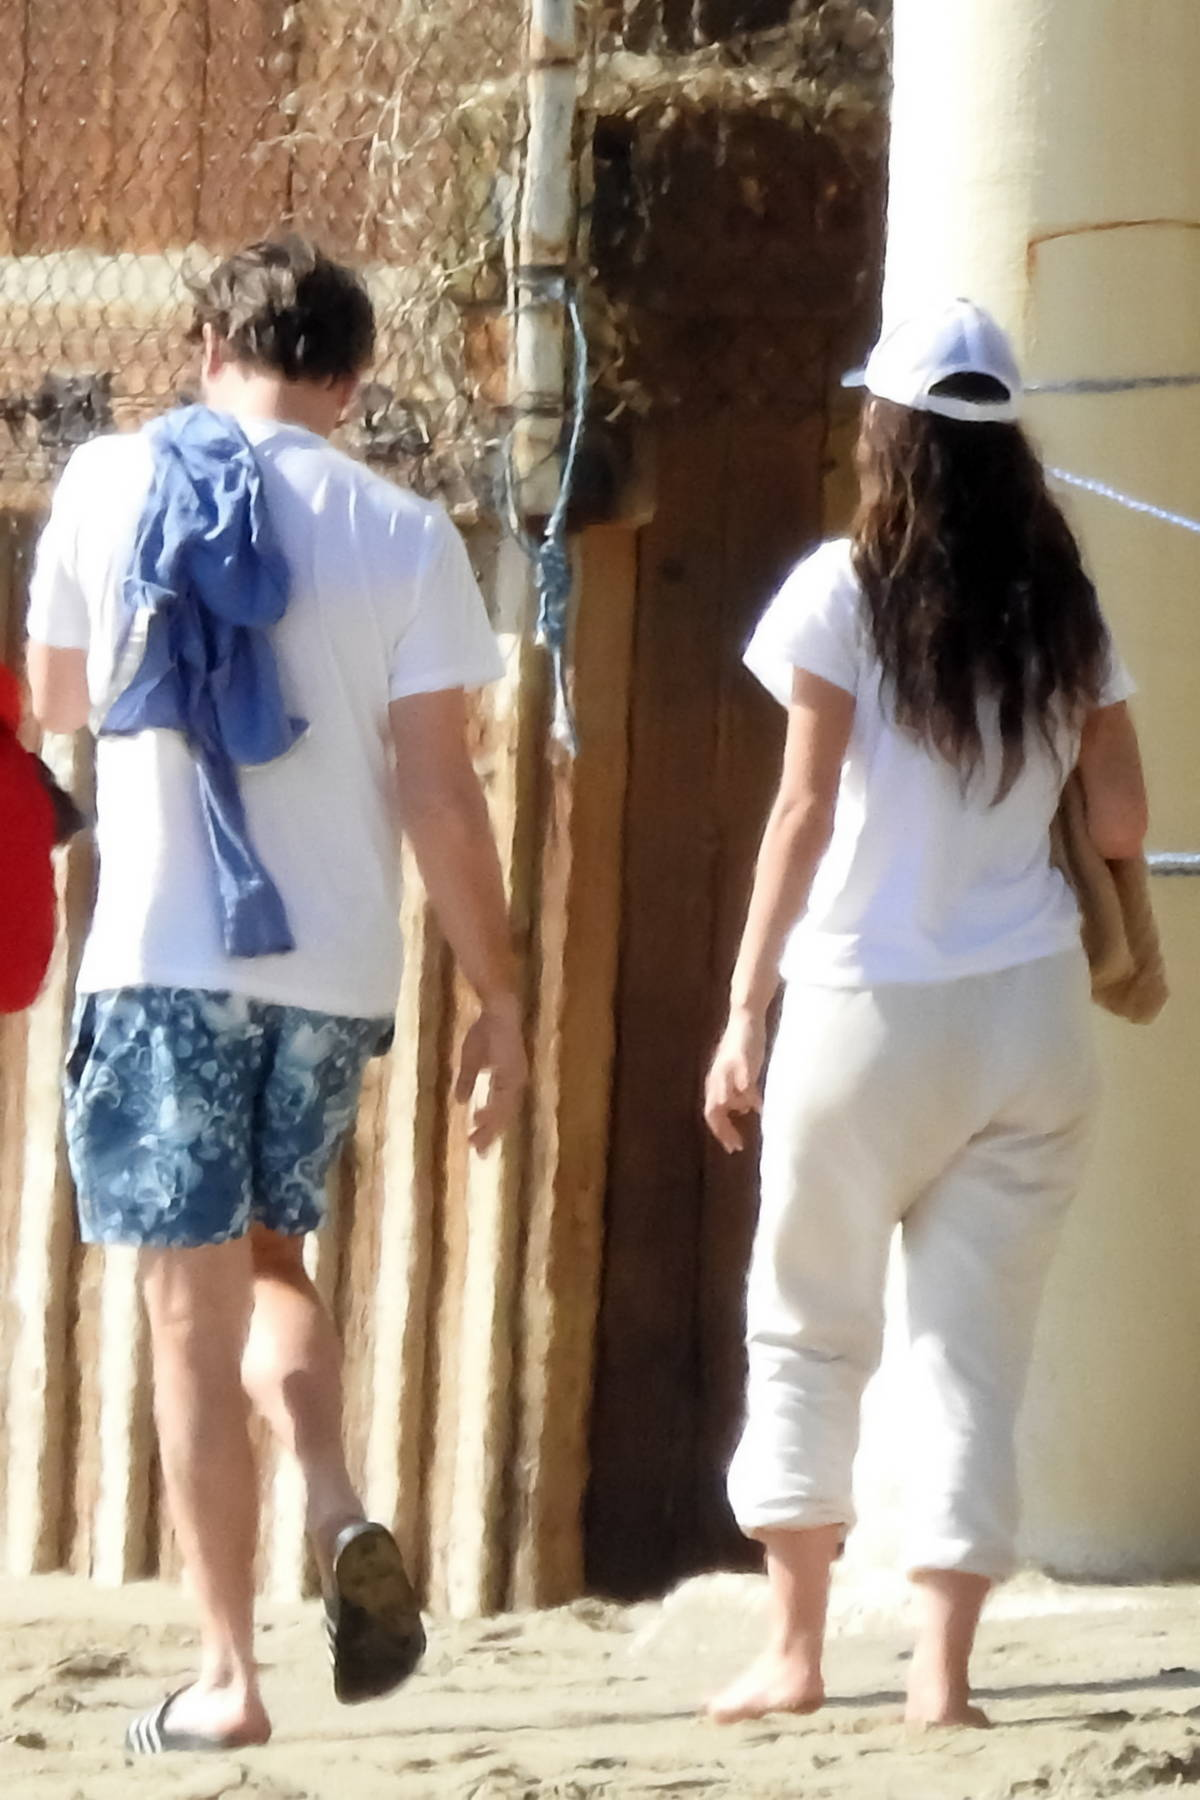 Camila Morrone and Leonardo DiCaprio step out to grab breakfast in Malibu, California